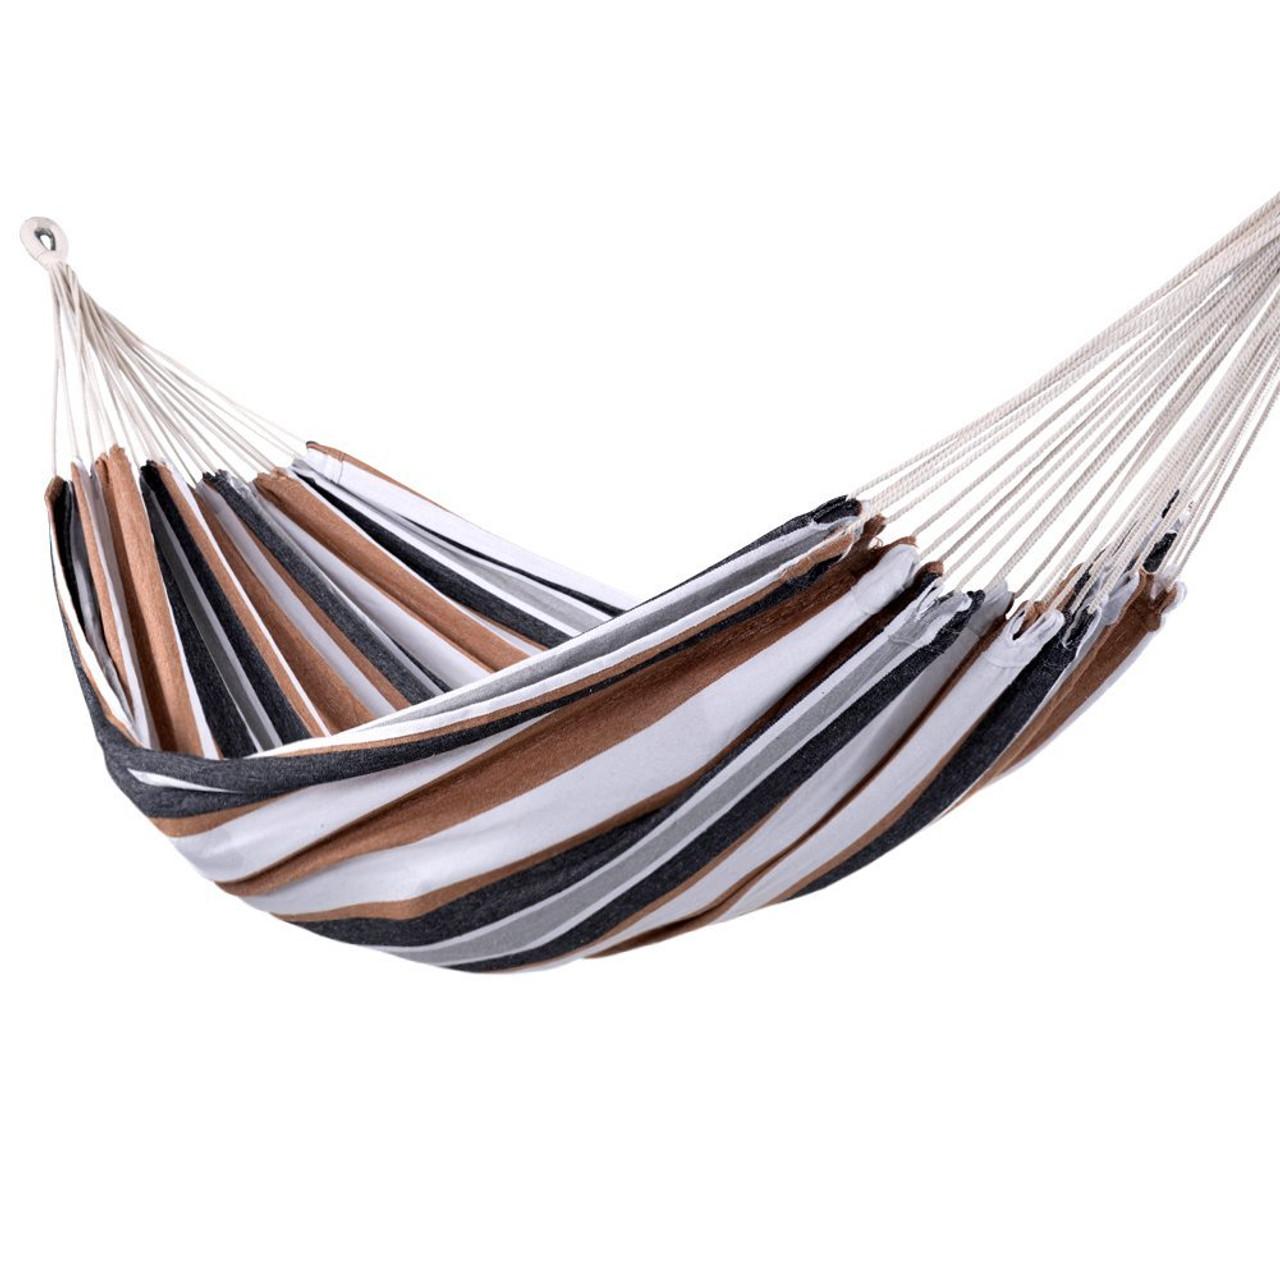 lazy daze hammocks portable double size canvas hammock with carry bag 450 pounds capacity portable double size canvas hammock with carry bag 450 pounds      rh   sundaleoutdoor